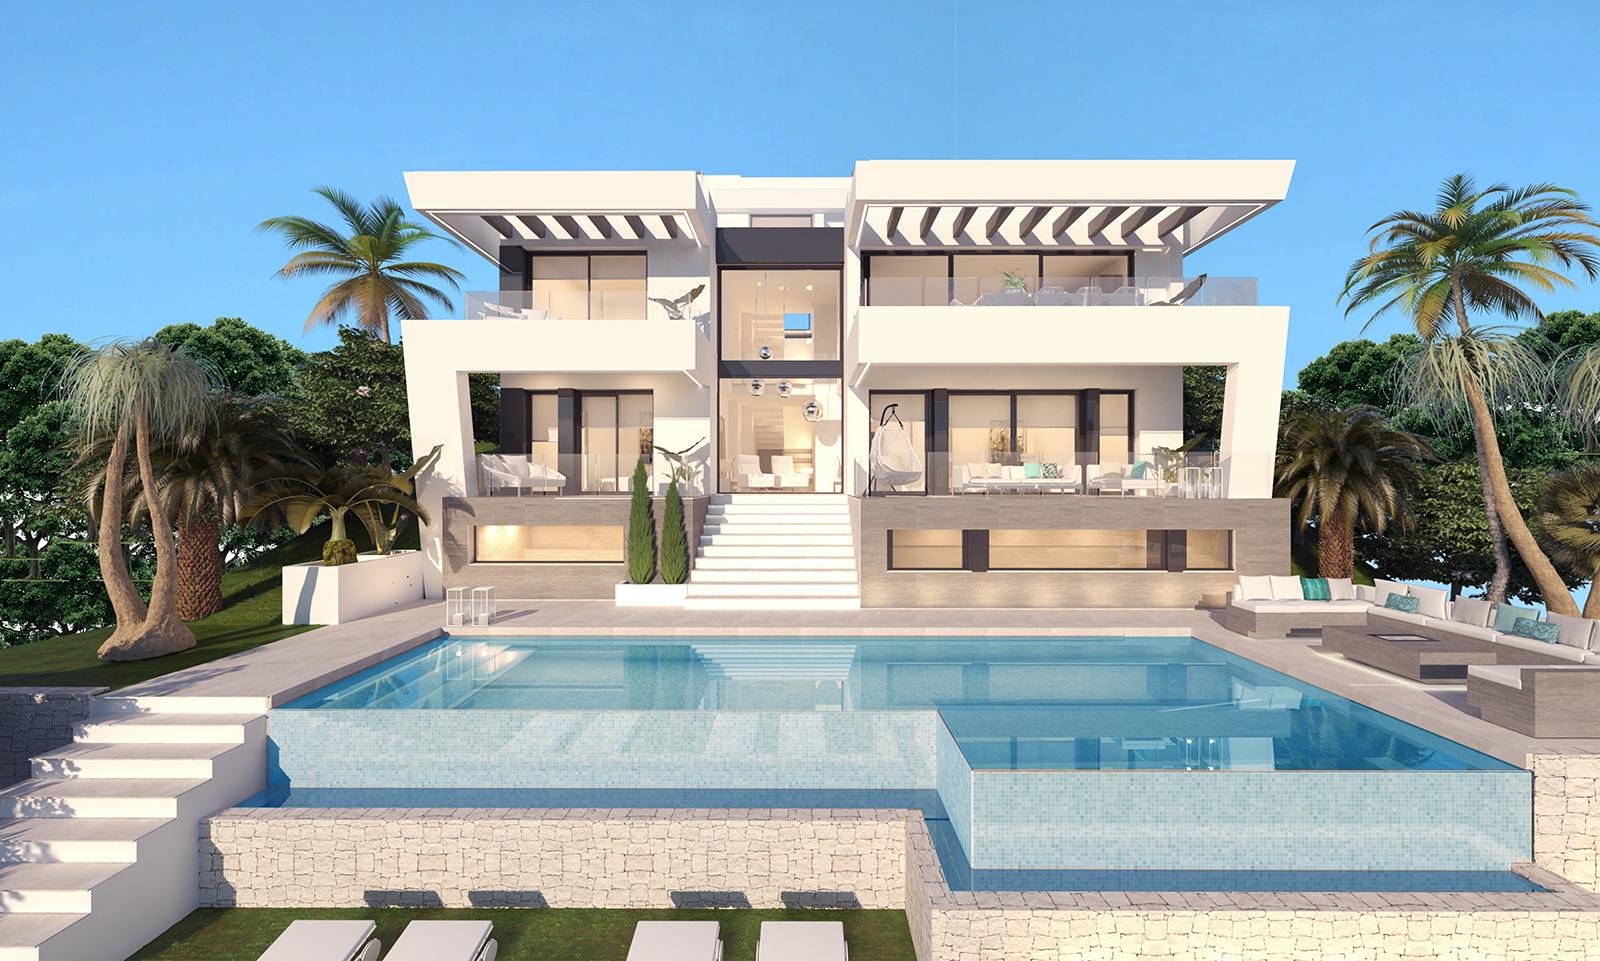 Exclusive plot with villa design in Mijas Golf